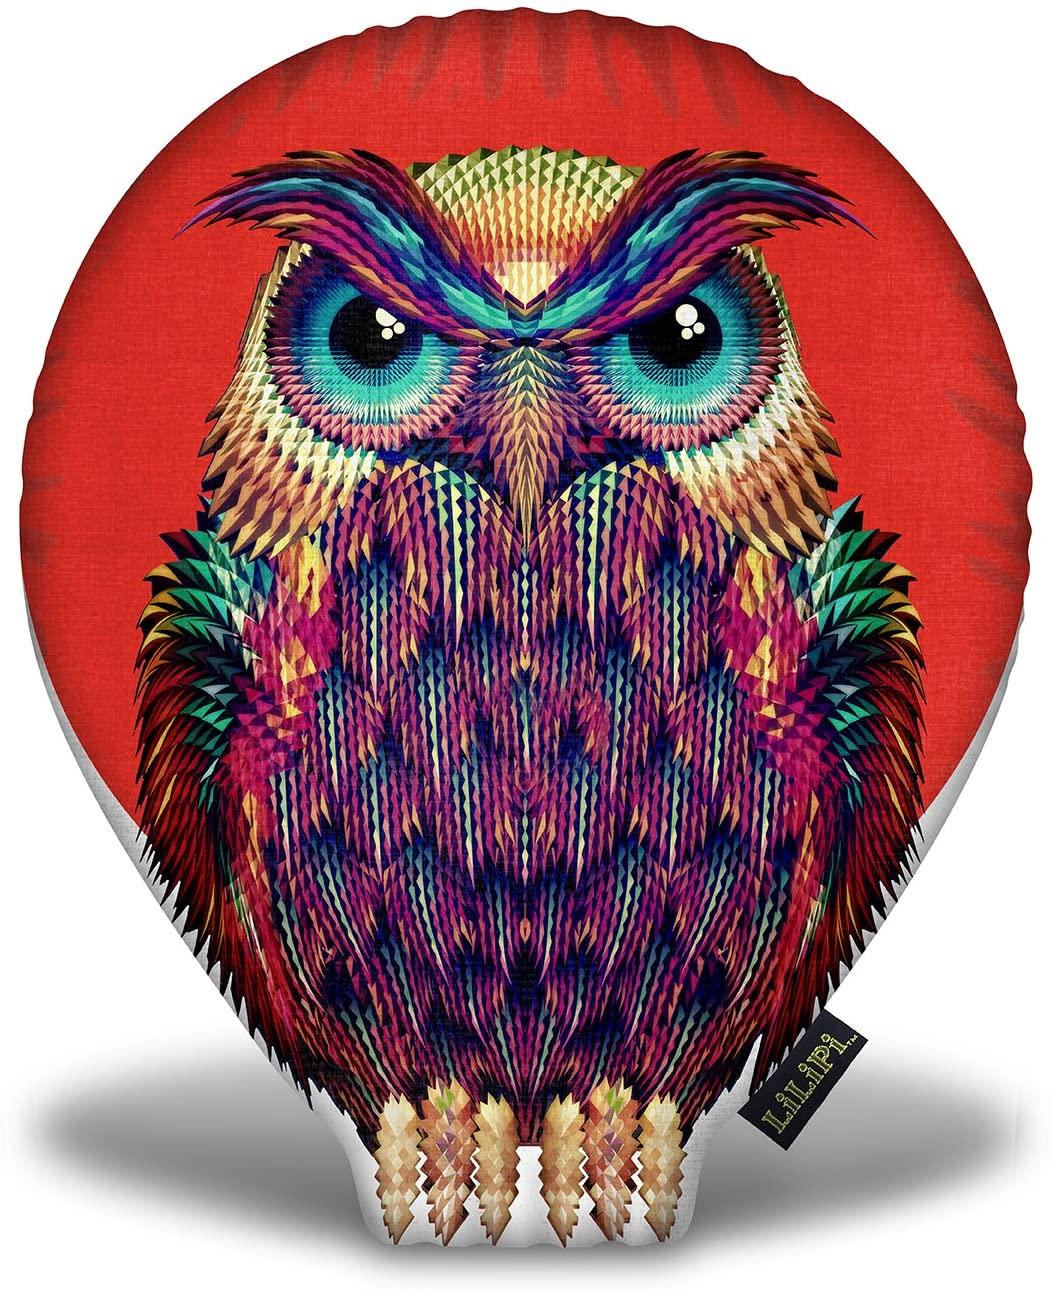 LiLiPi Owl 2 Tee Decorative Accent Throw Pillow